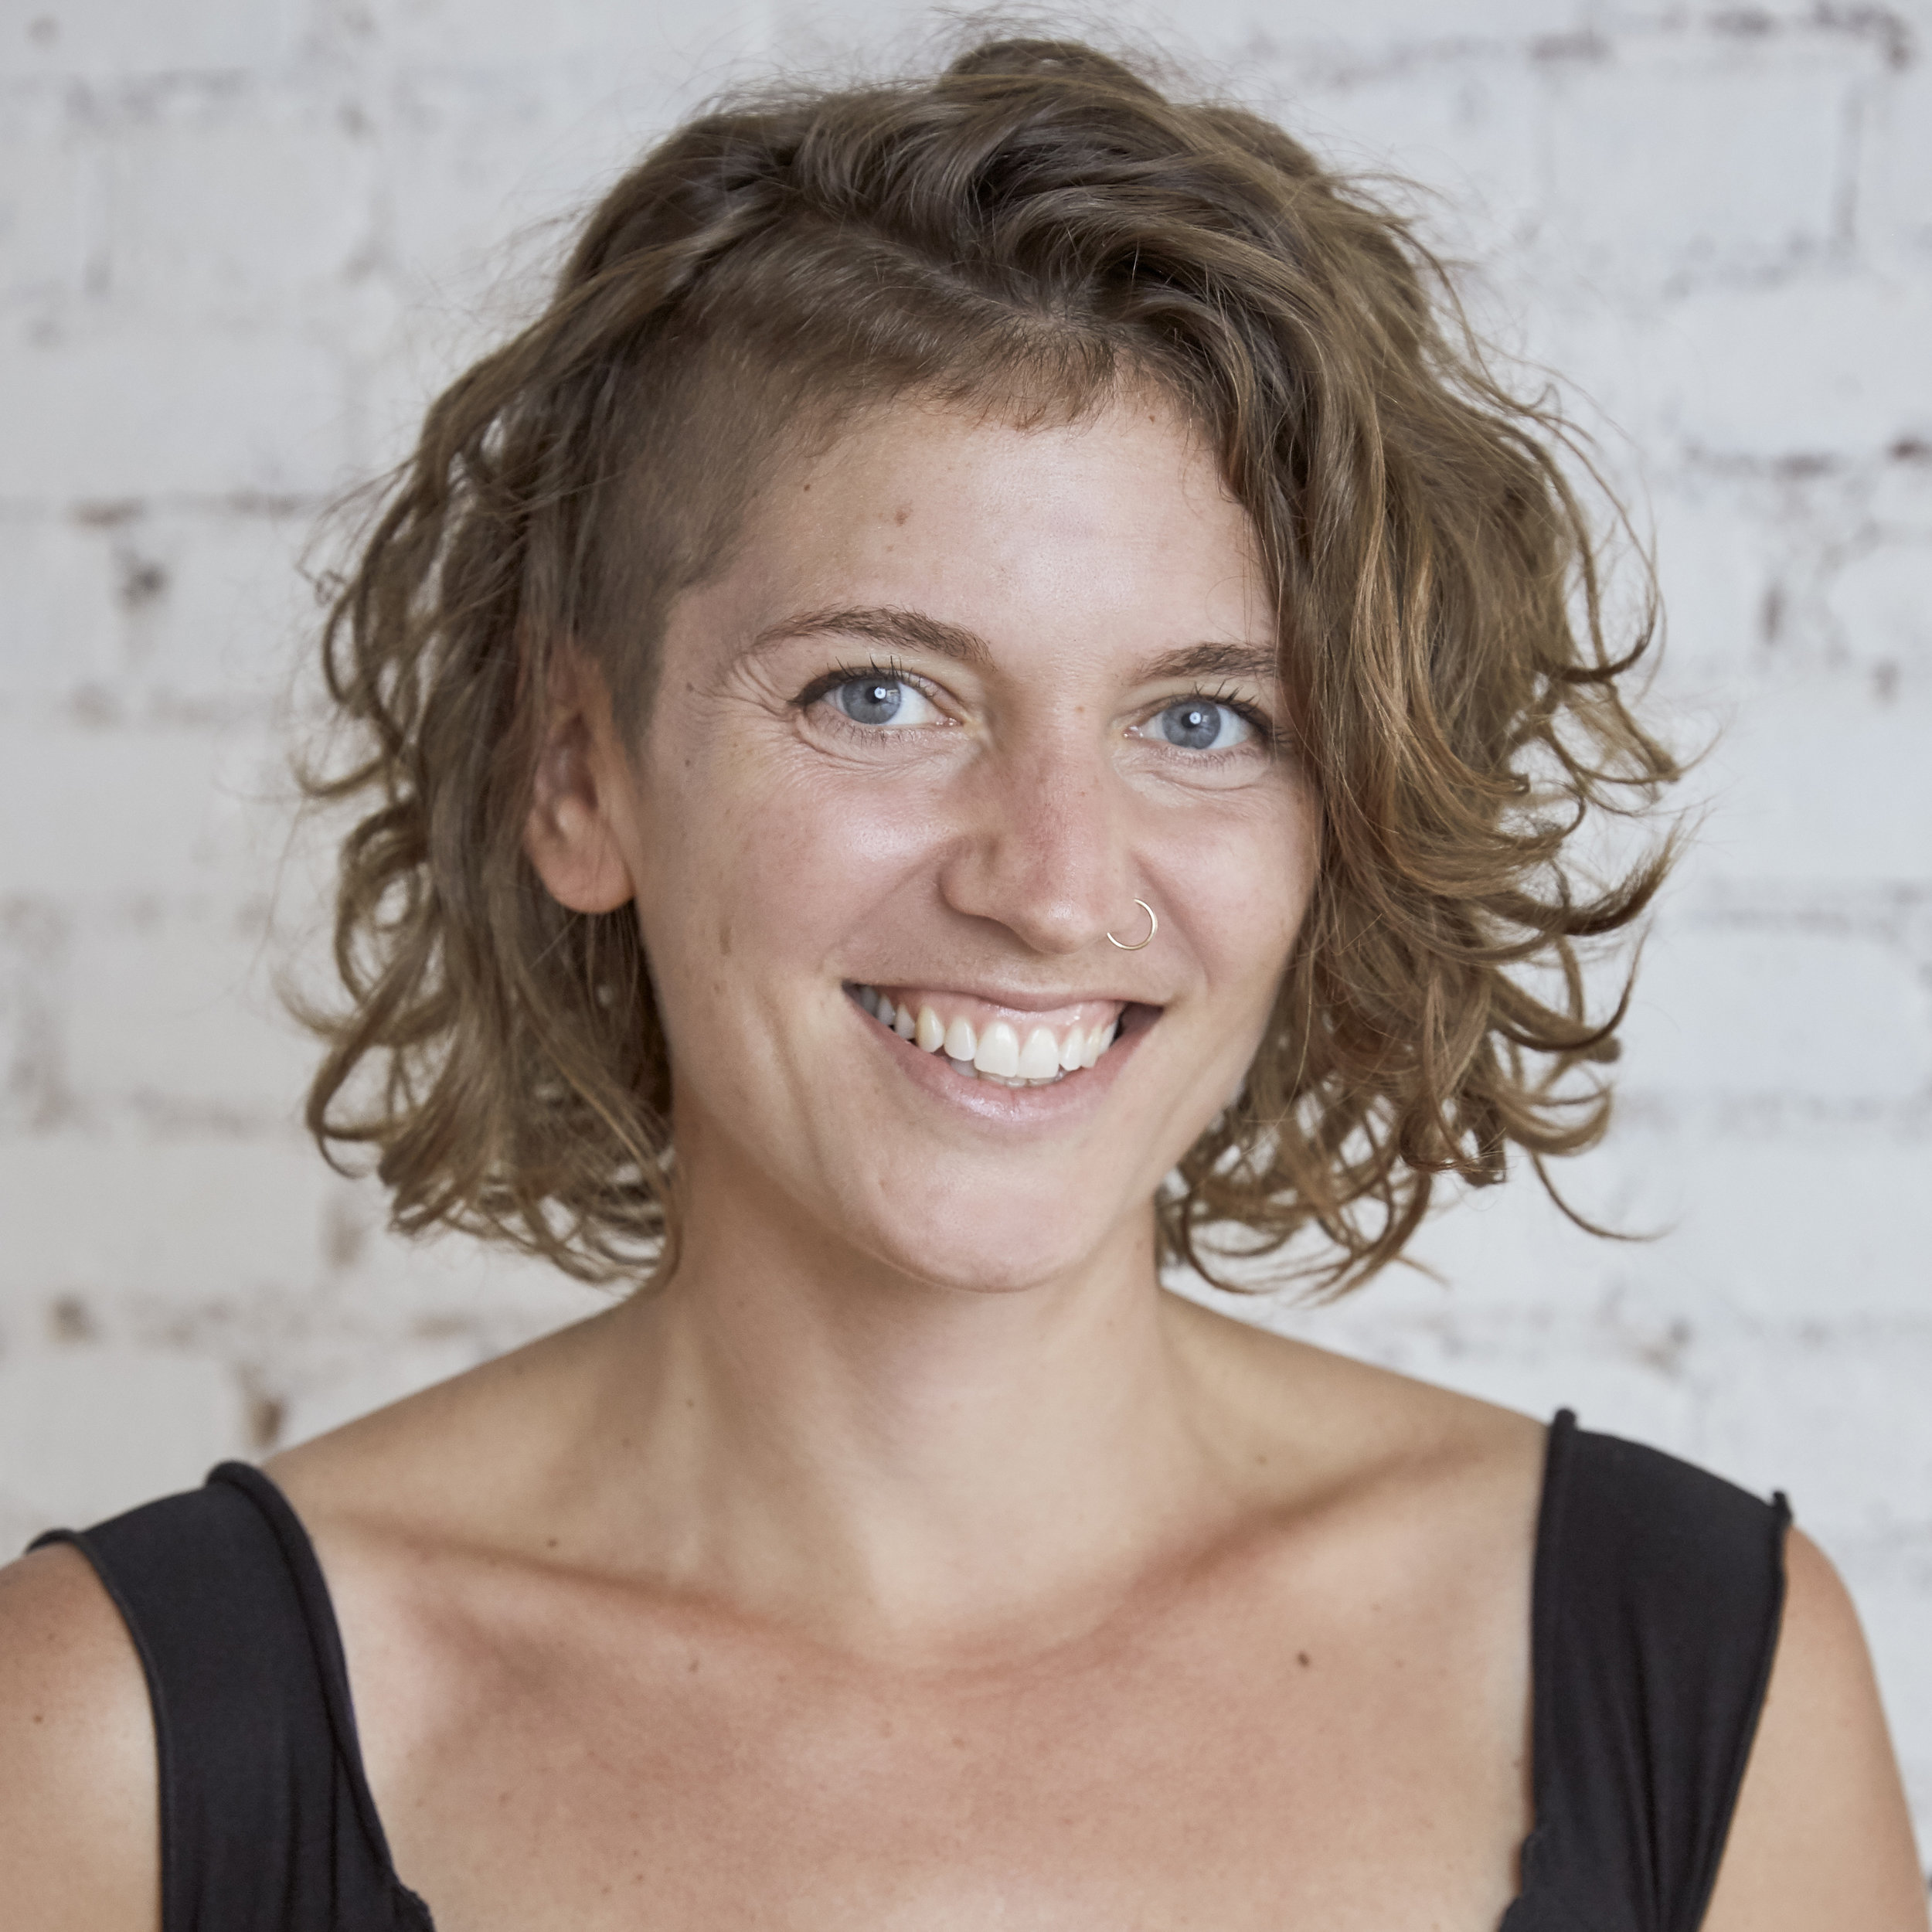 Zoe Rabinowitz